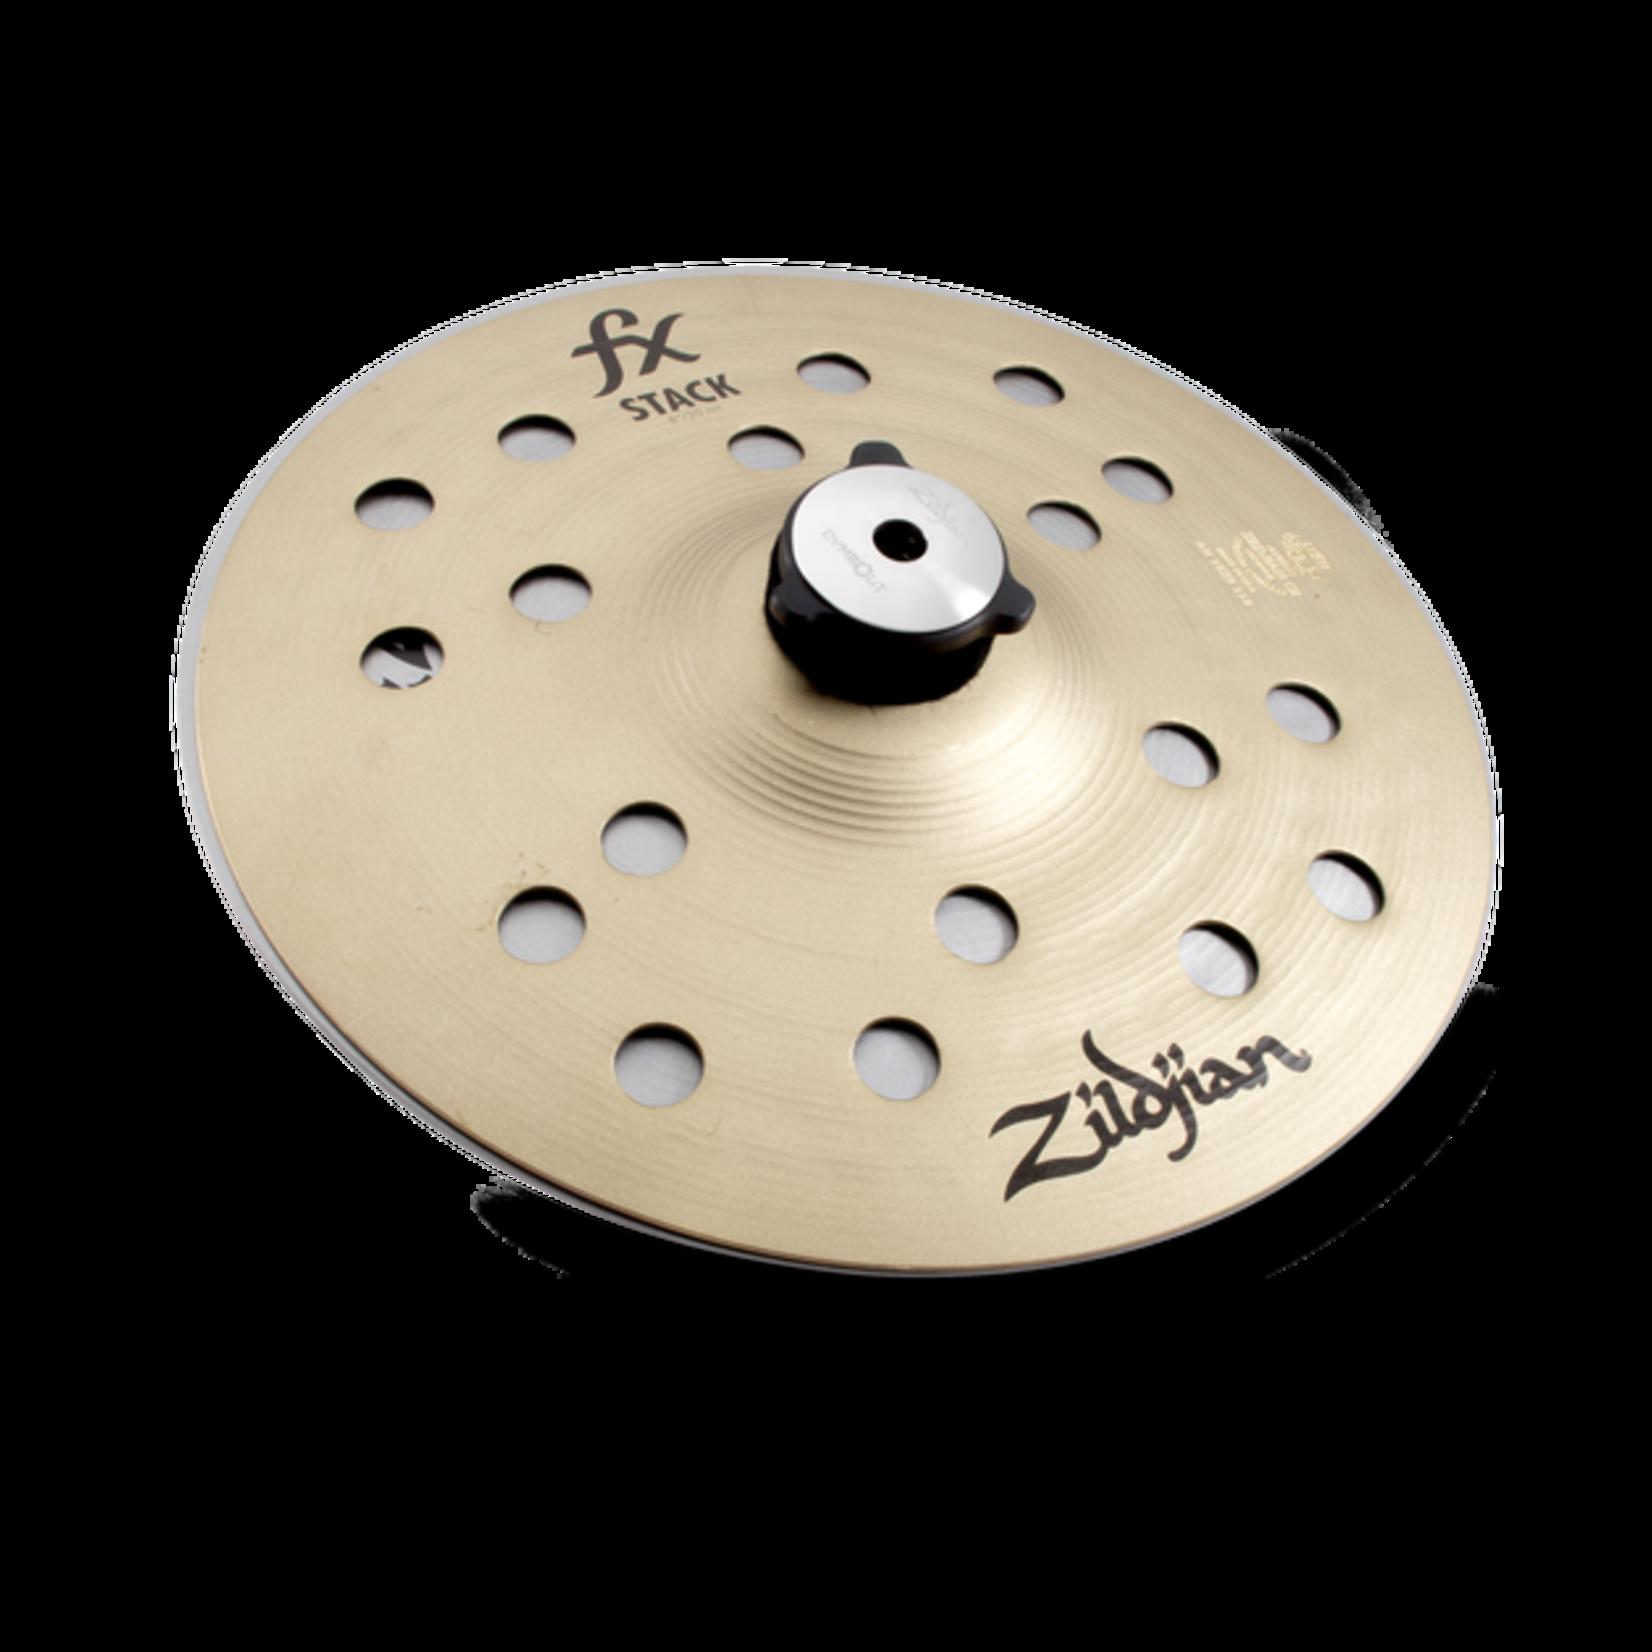 "Zildjian Zildjian 12"" FX Stack Pair w/Mount"